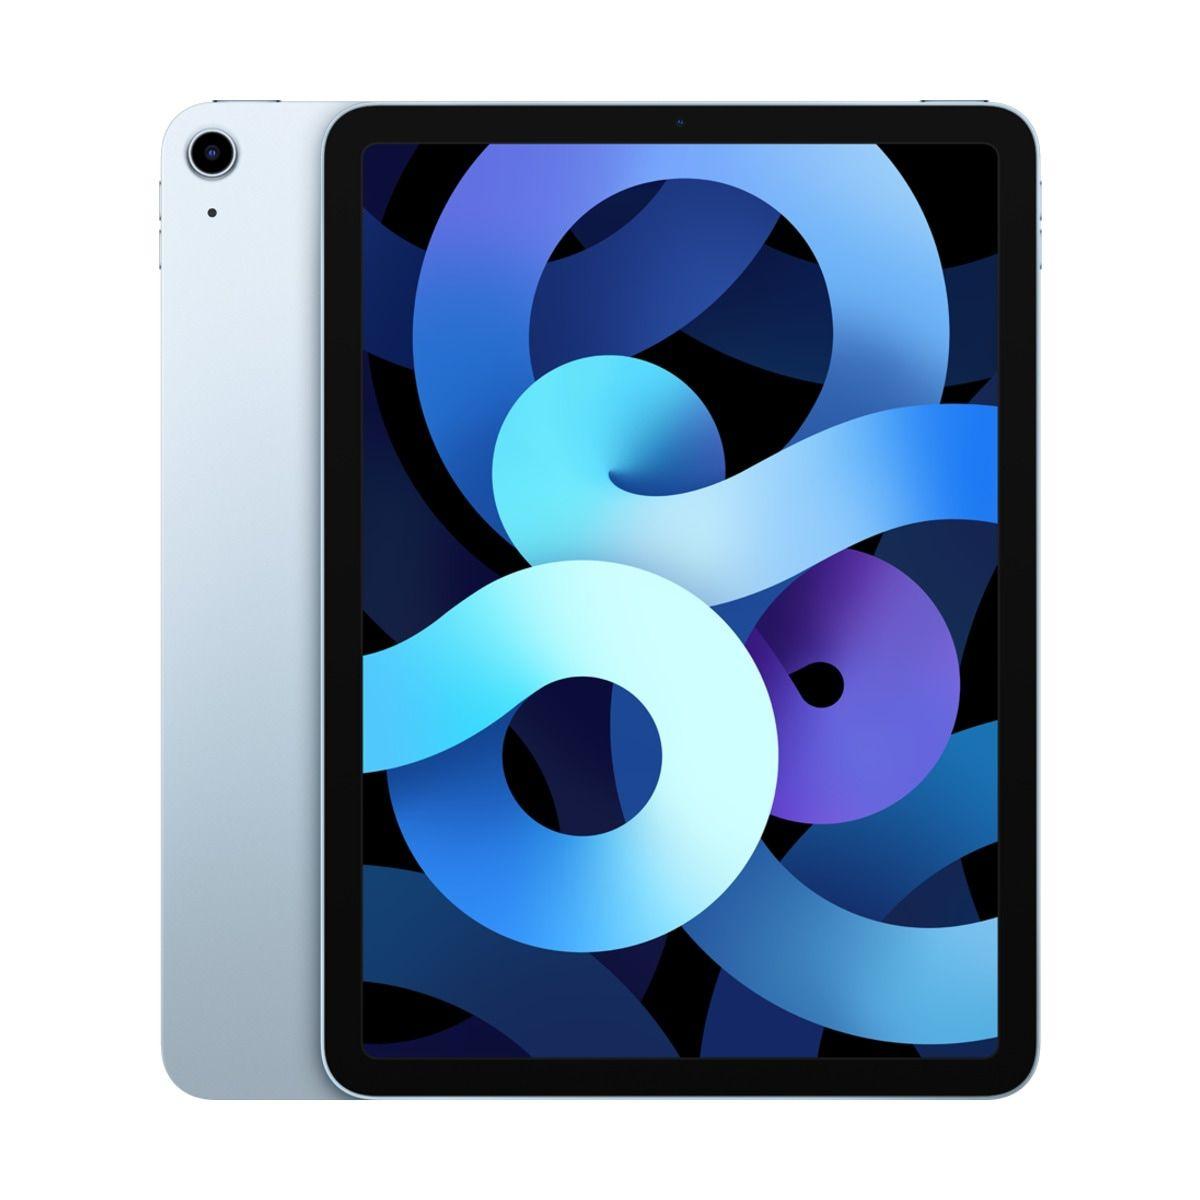 Apple iPad Air Wi-Fi + Cell 64GB - Sky Blue / SK